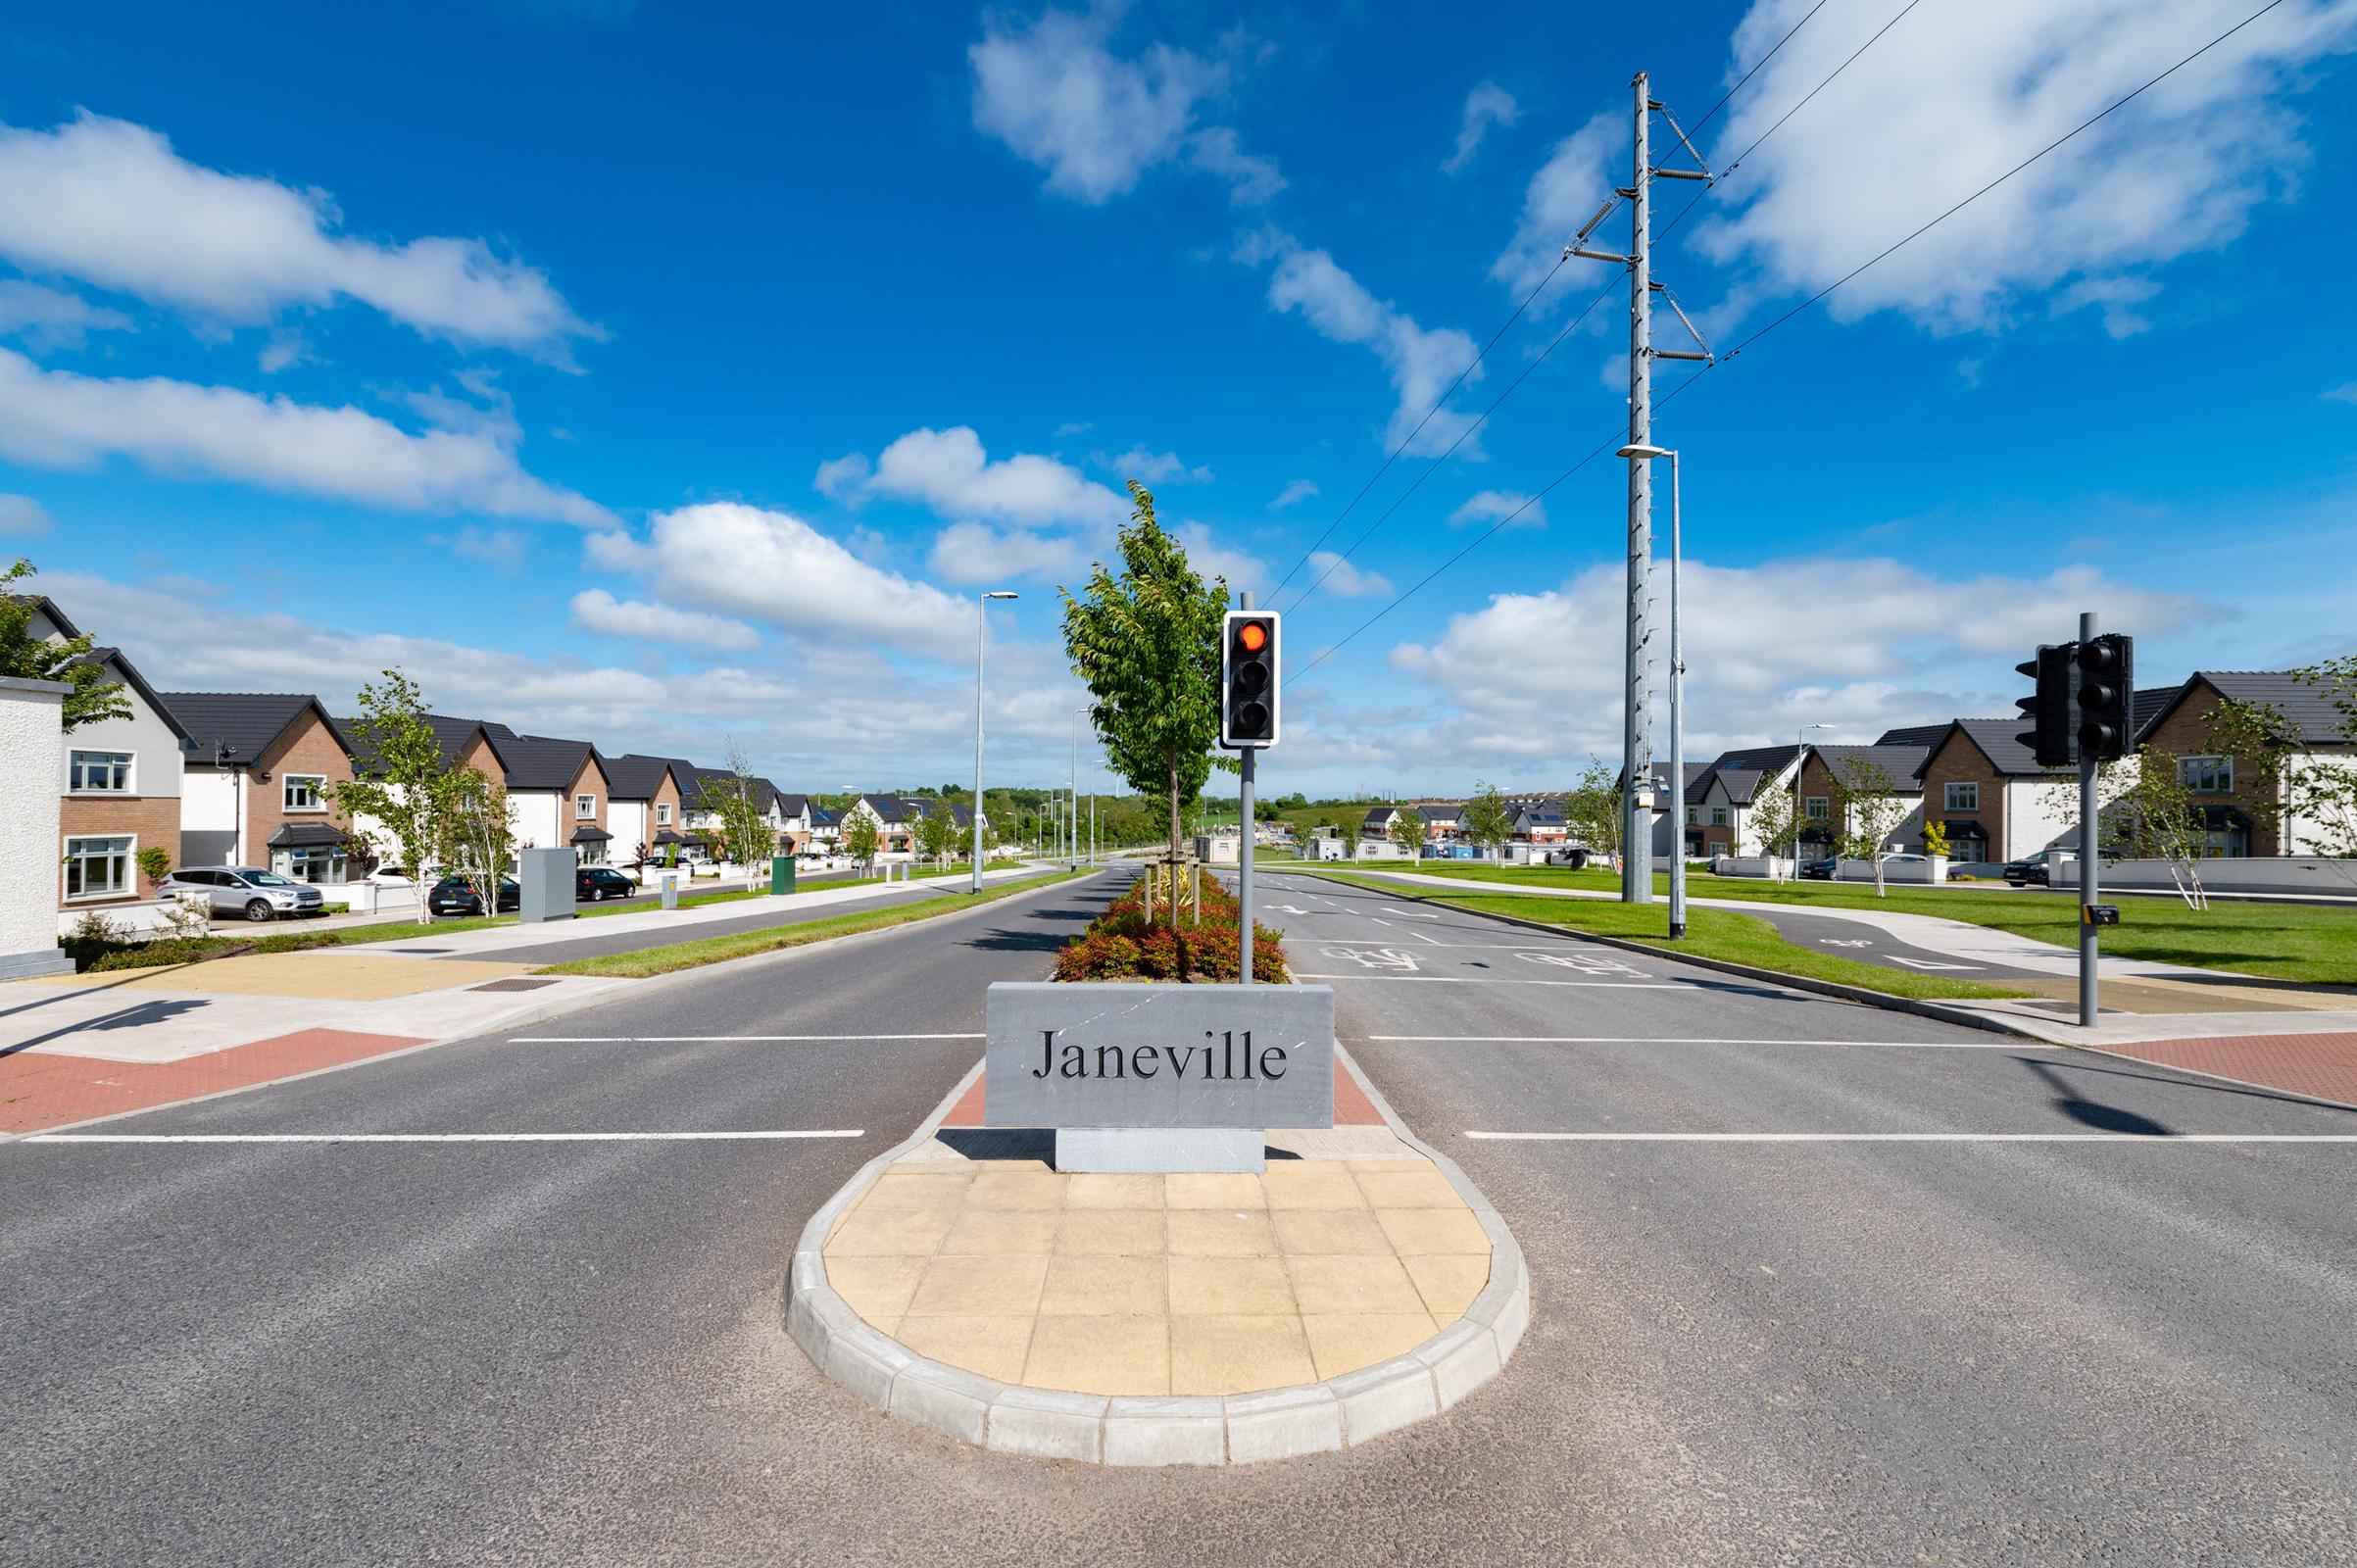 B1 House Type, 'Janeville', Carrigaline, Co. Cork